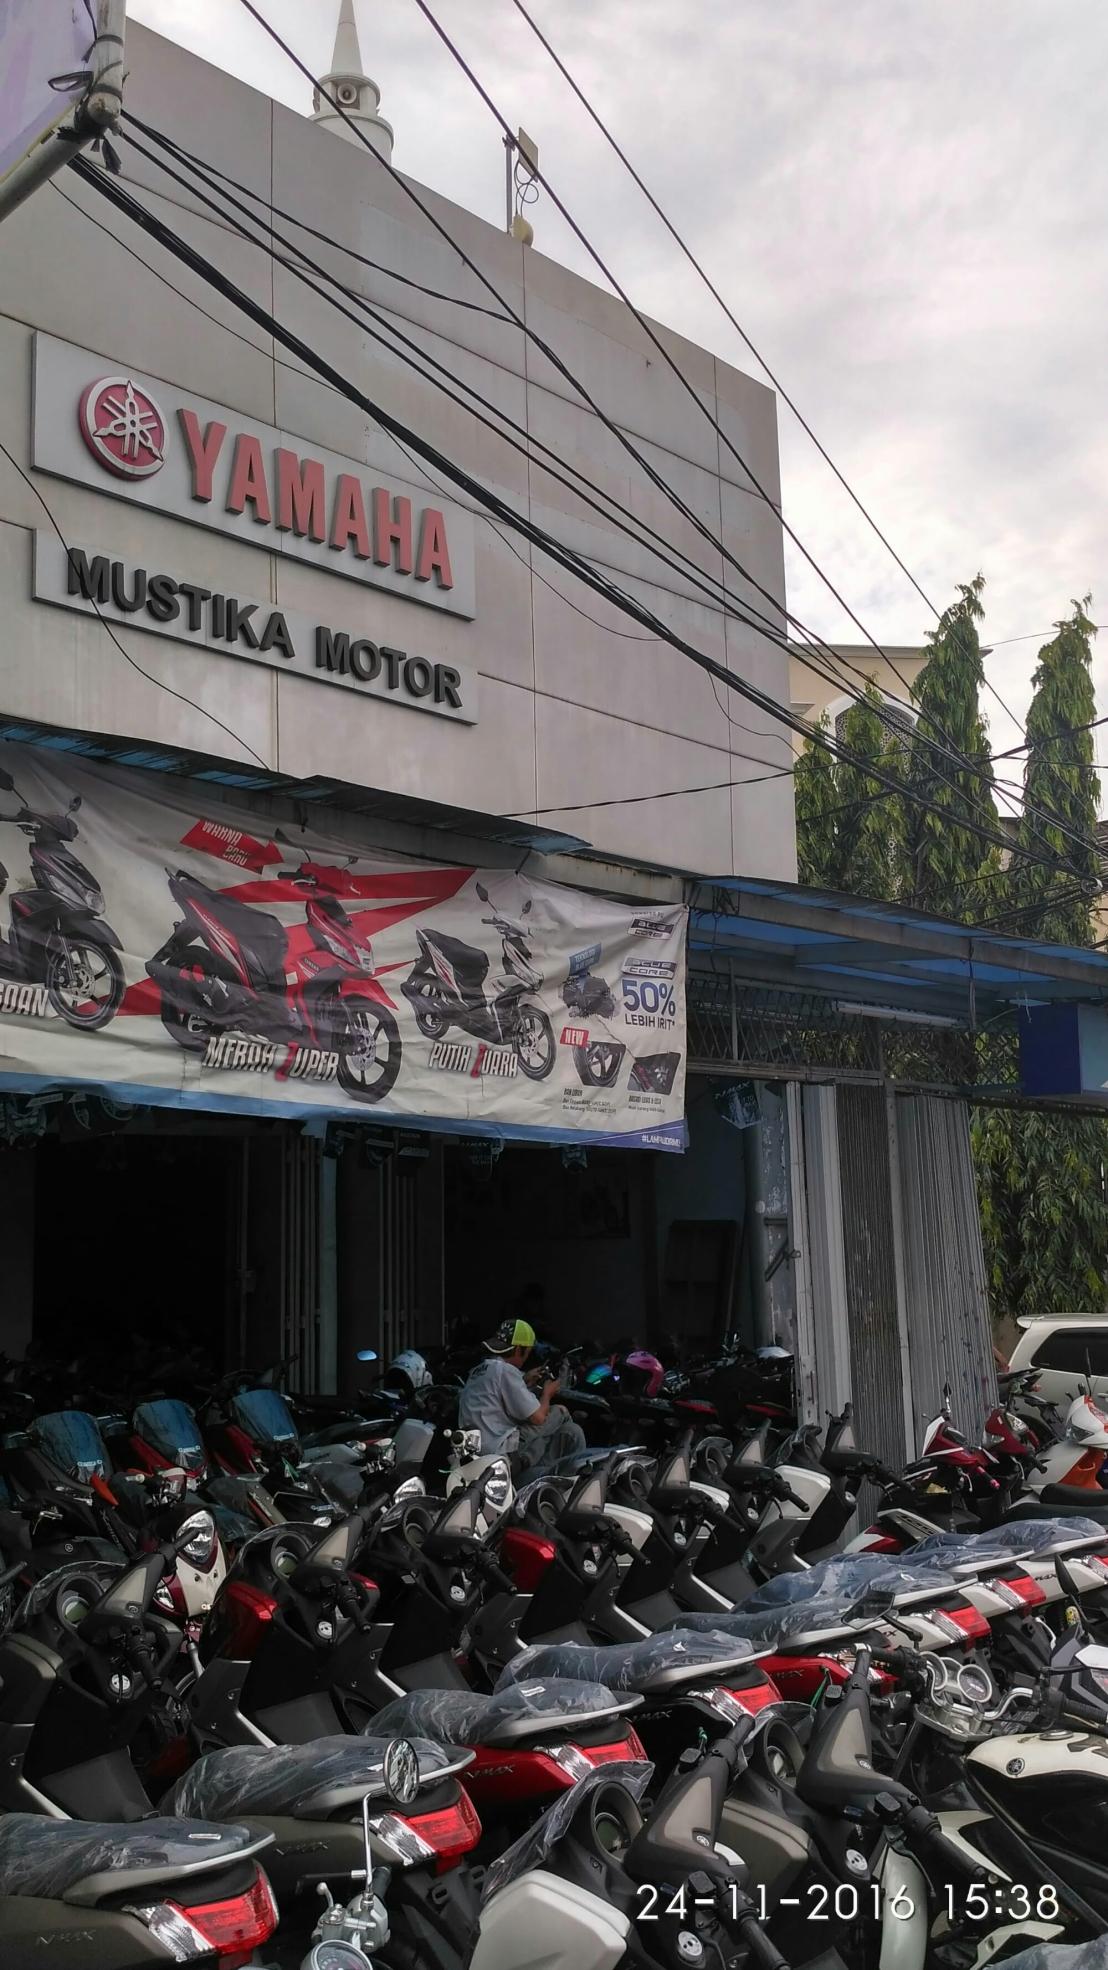 Dealer Resmi Yamaha Mustika Motor – Harga Cash Kredit MotorYamaha